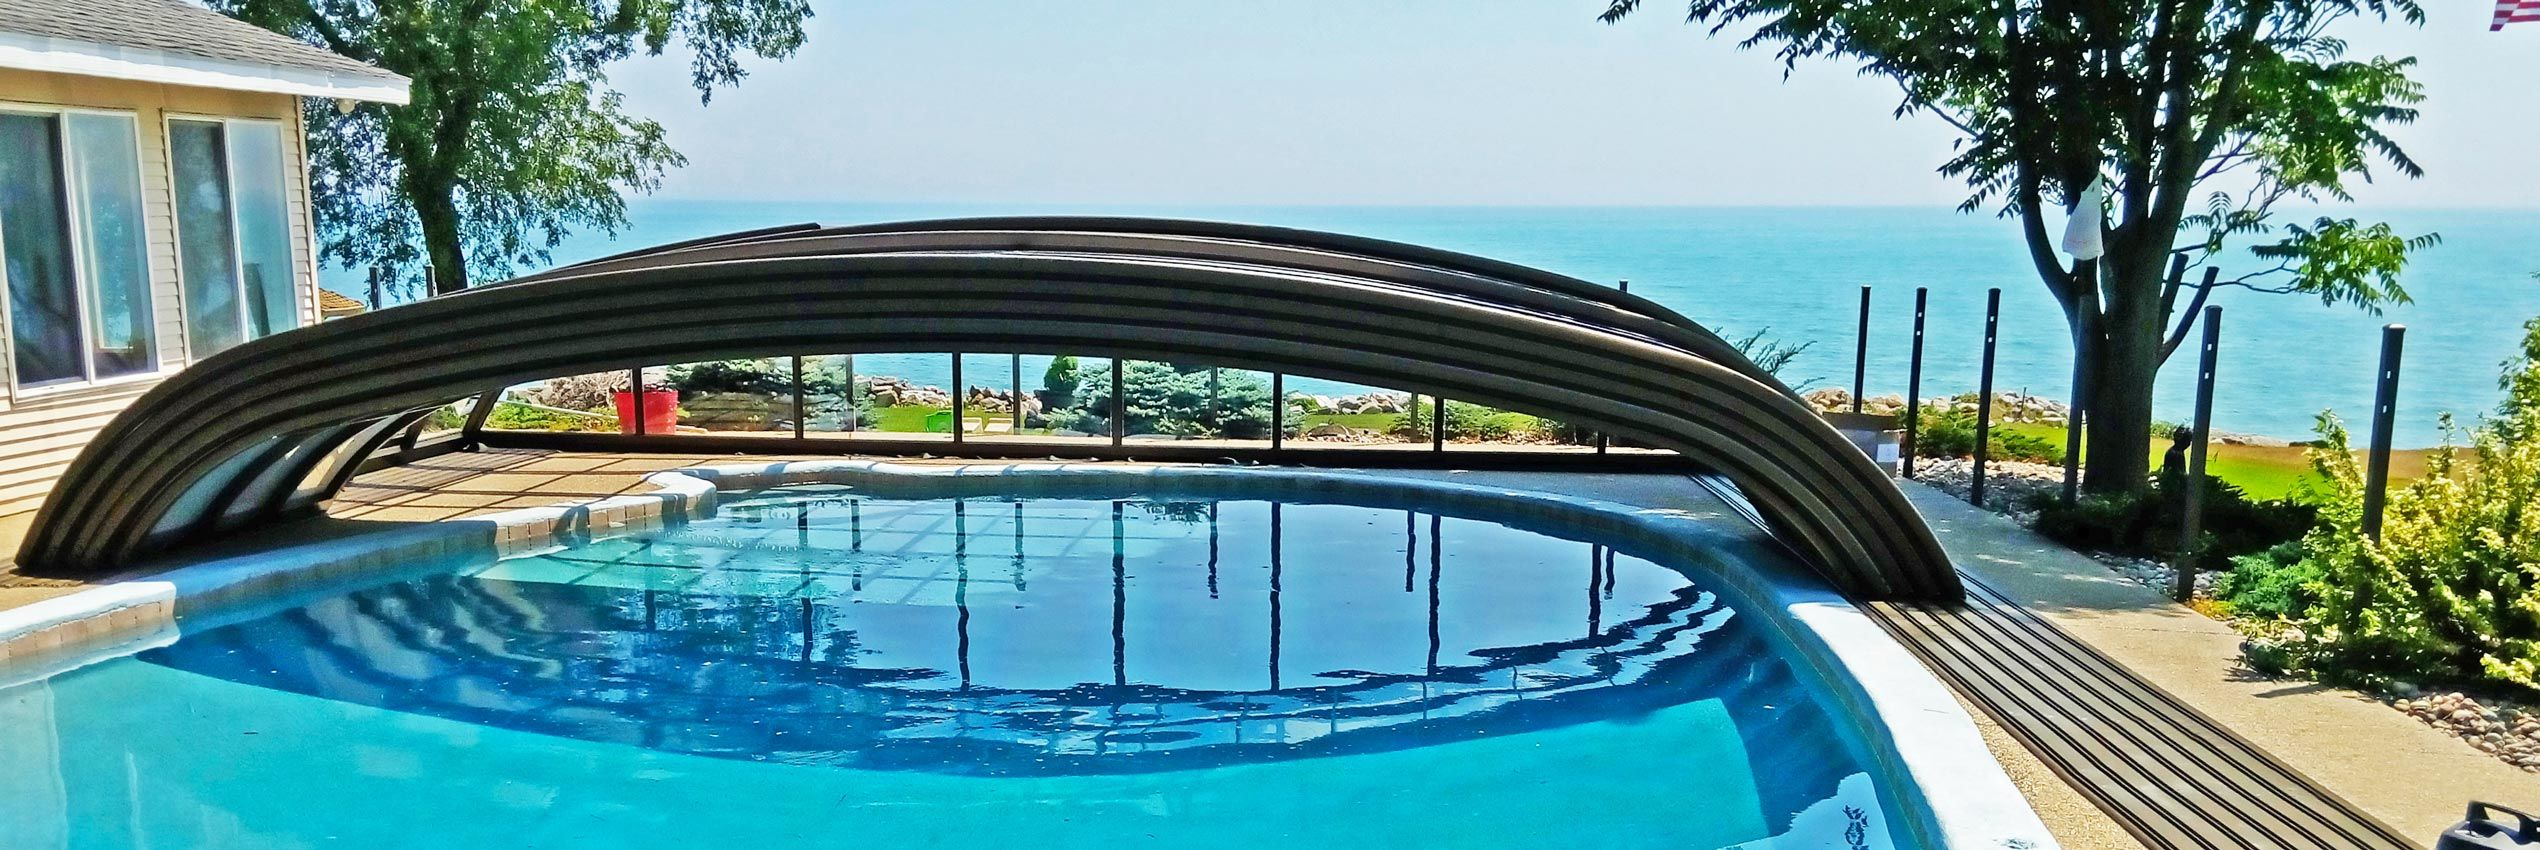 Poolüberdachung Elegant Neo Von Alukov | Alukov.at concernant Piscine Auch